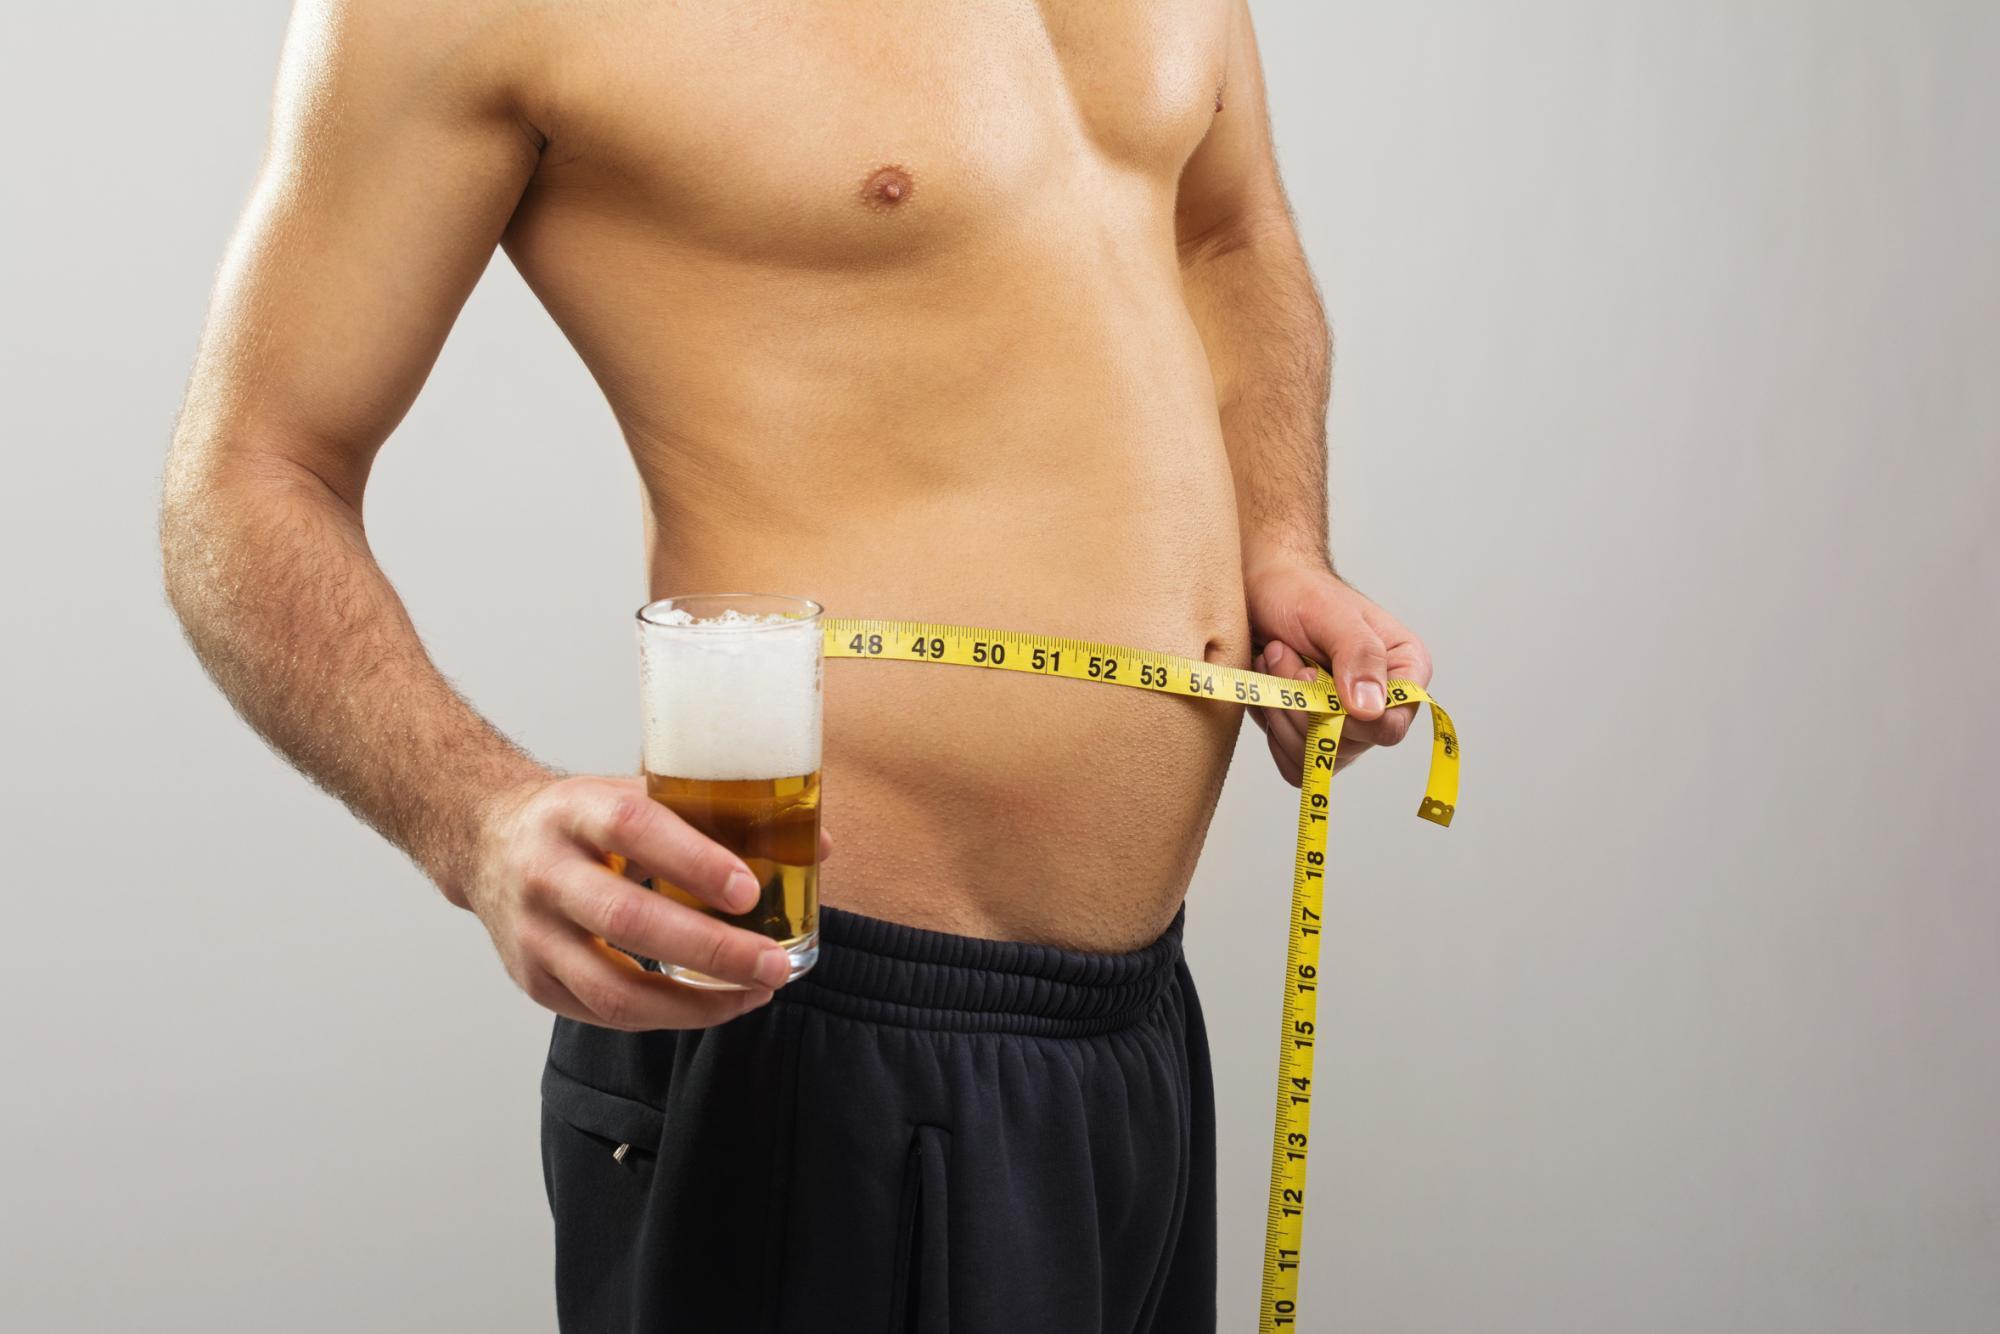 L'alcool fait-il grossir ? Nos explications. - VieHealthy